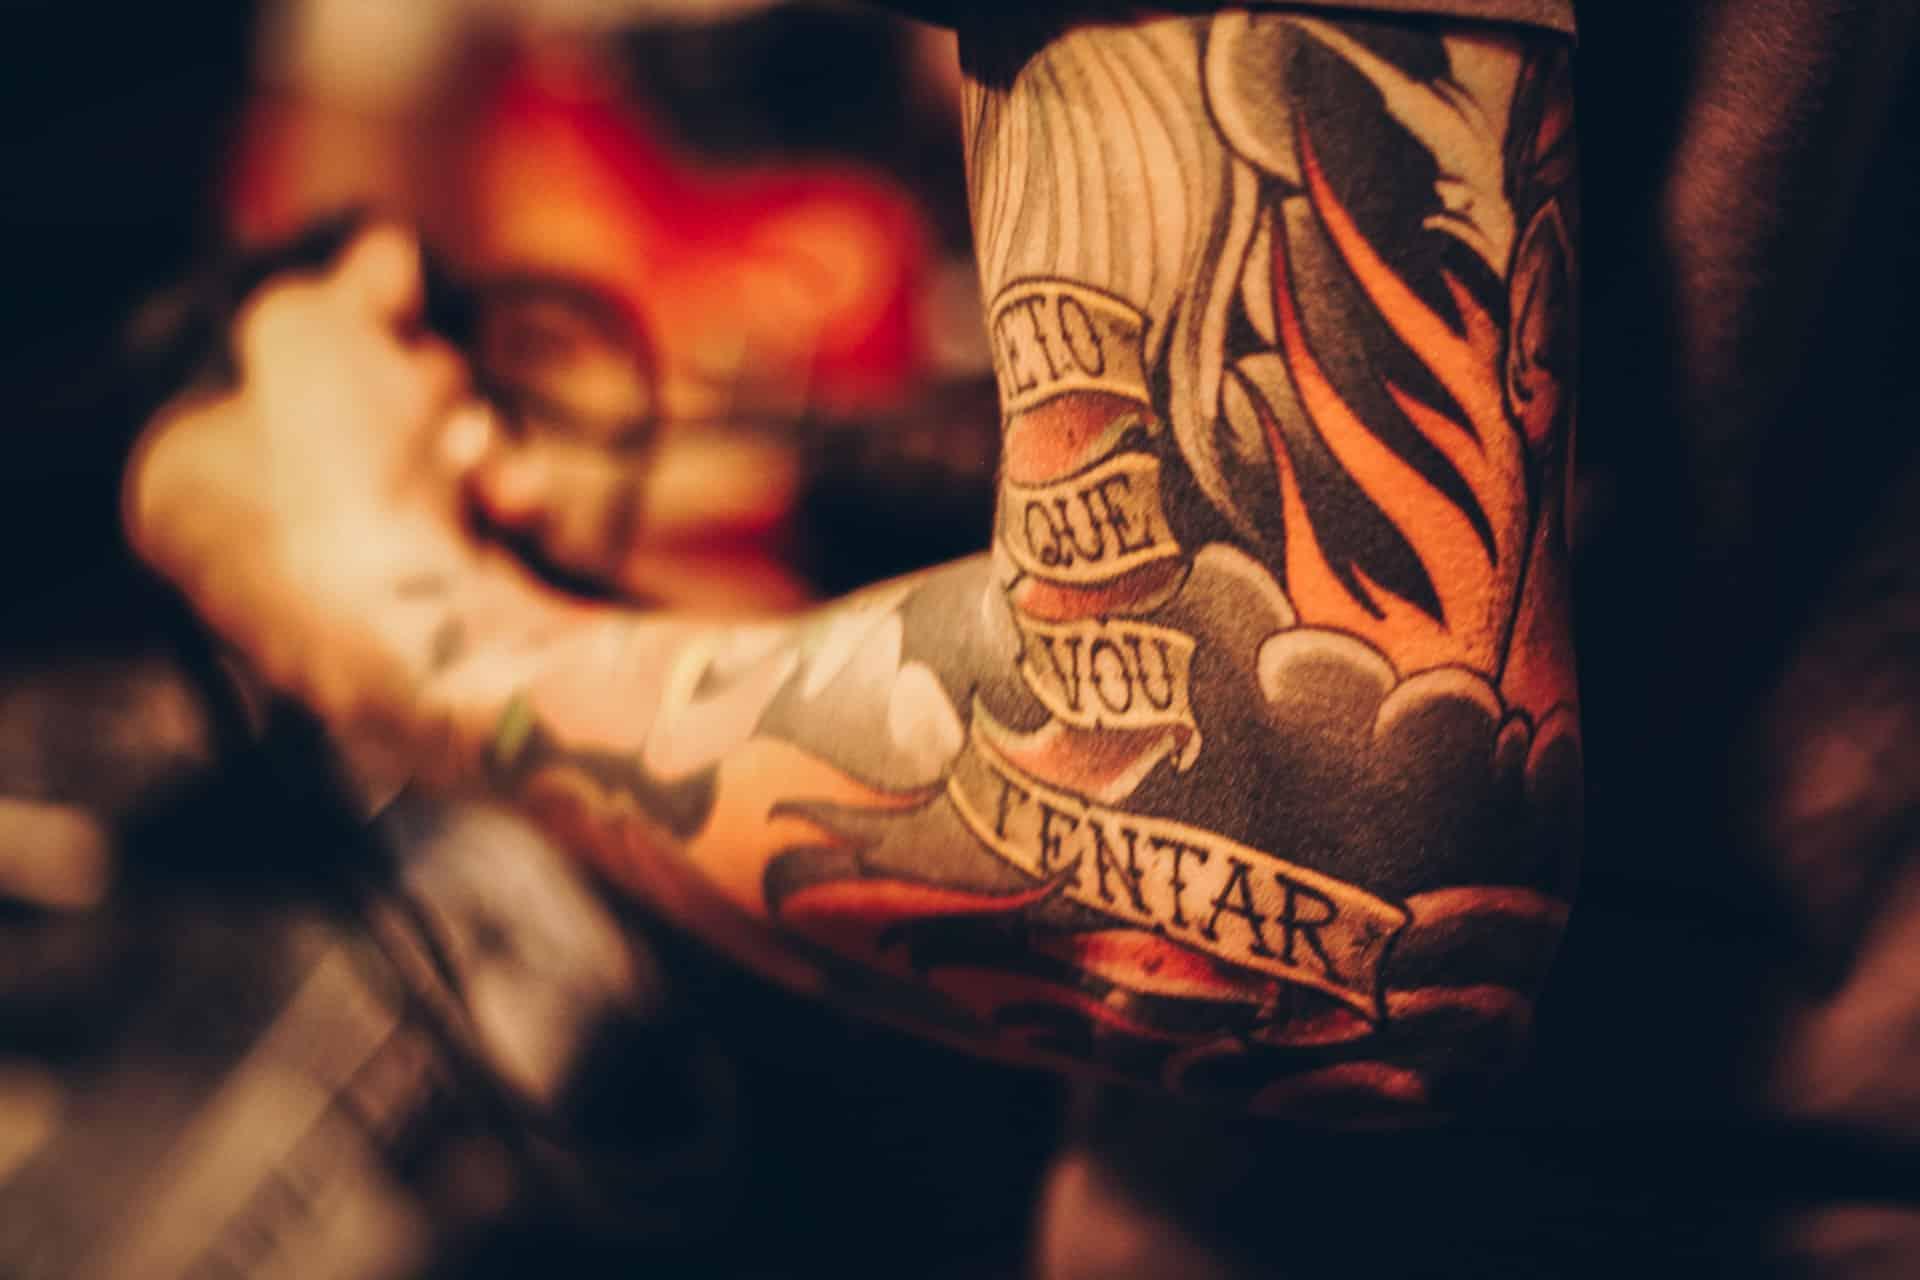 A Tattoo-Worthy Studio Experience